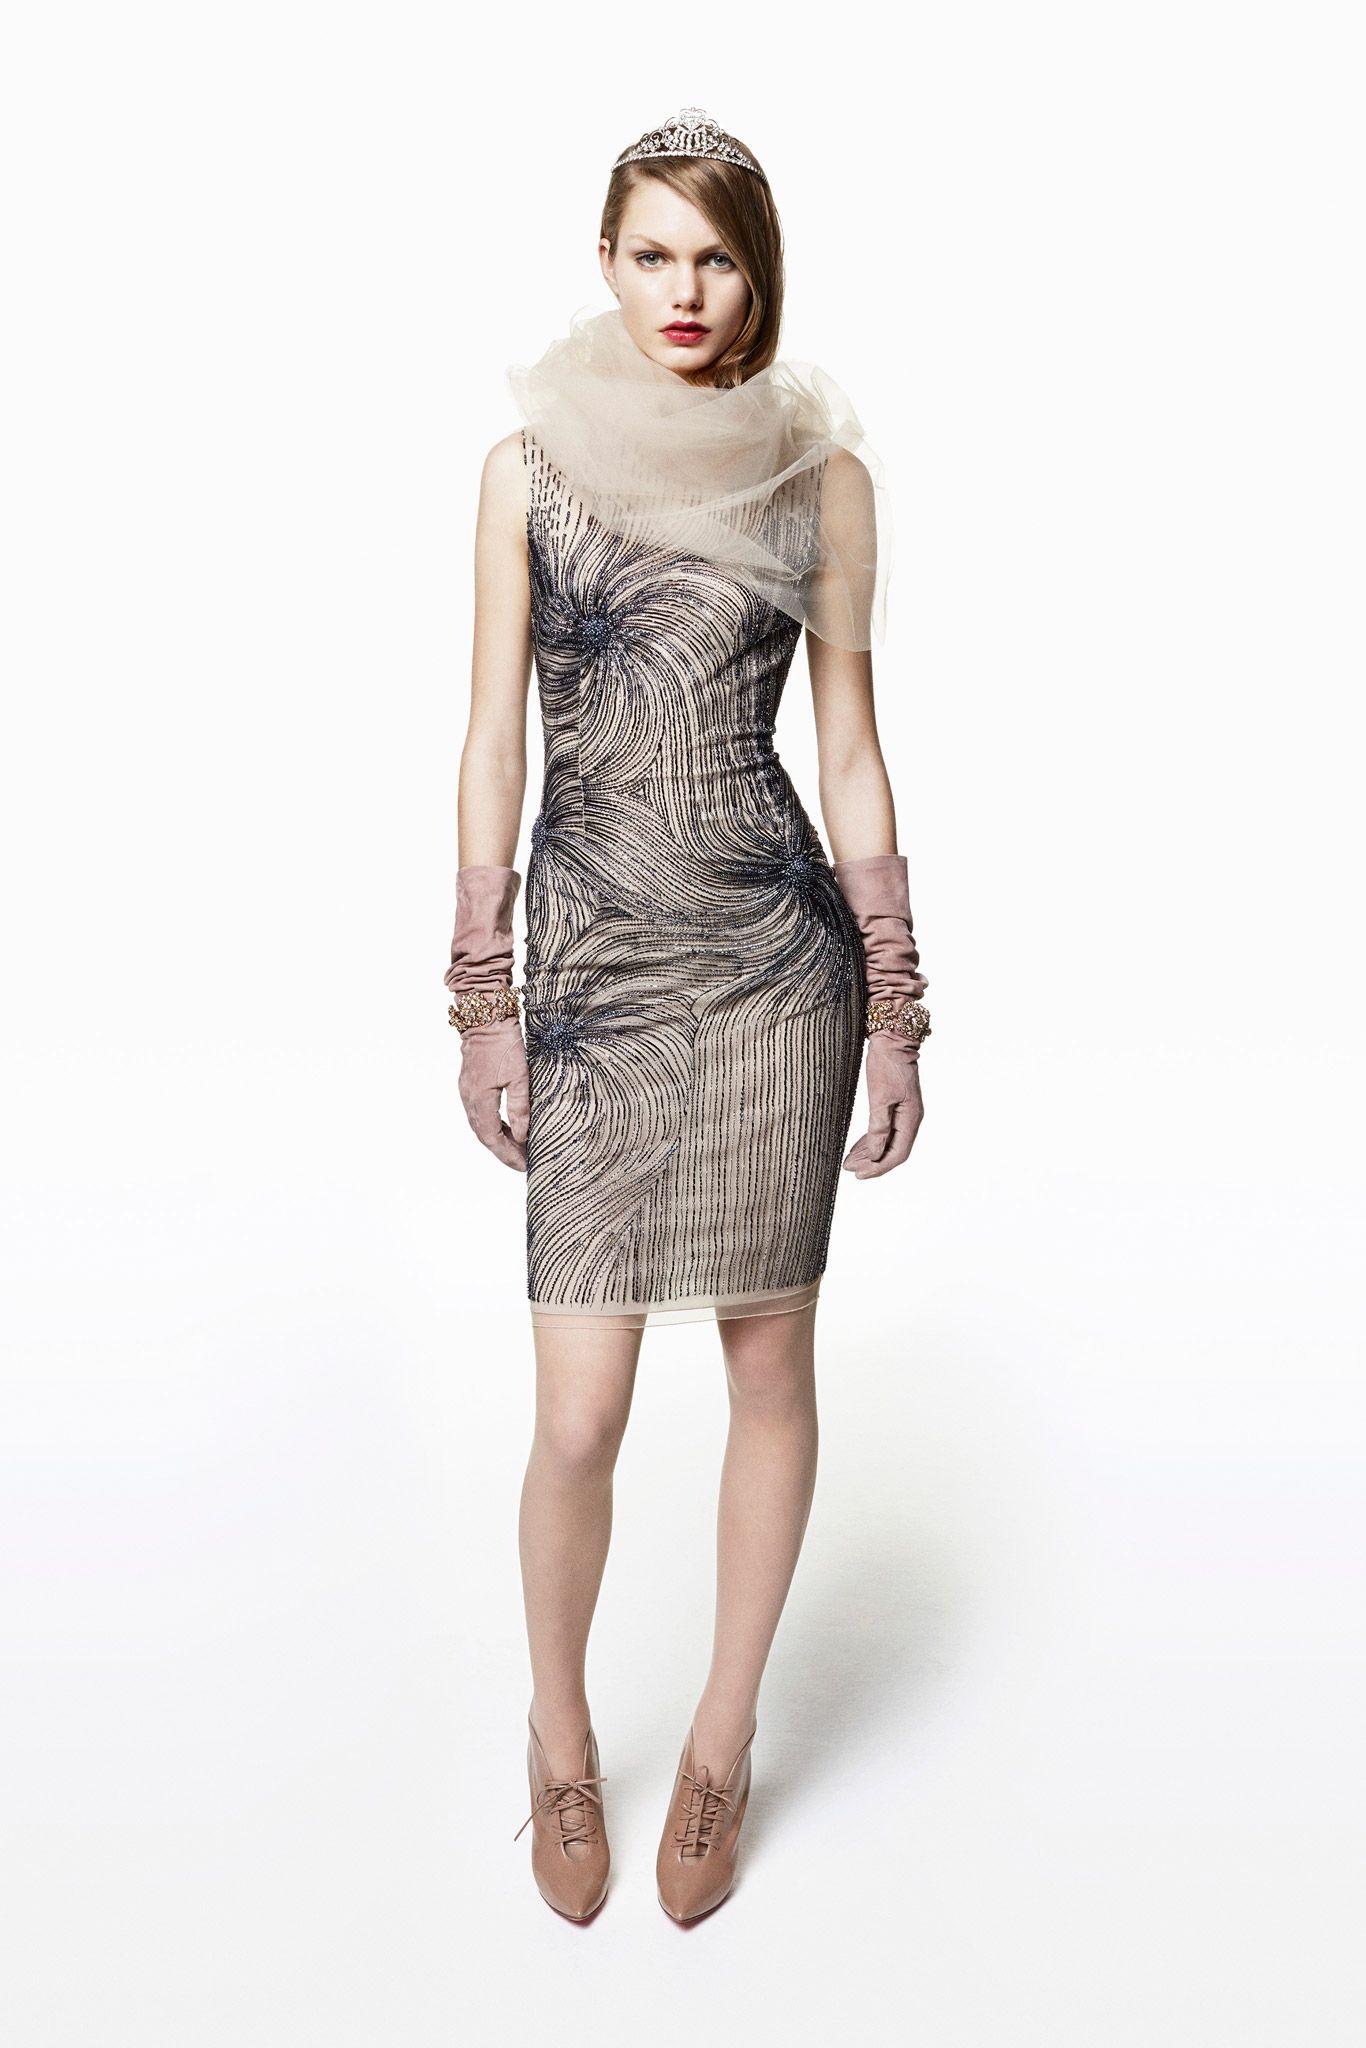 Lea michele blumarine dress lace